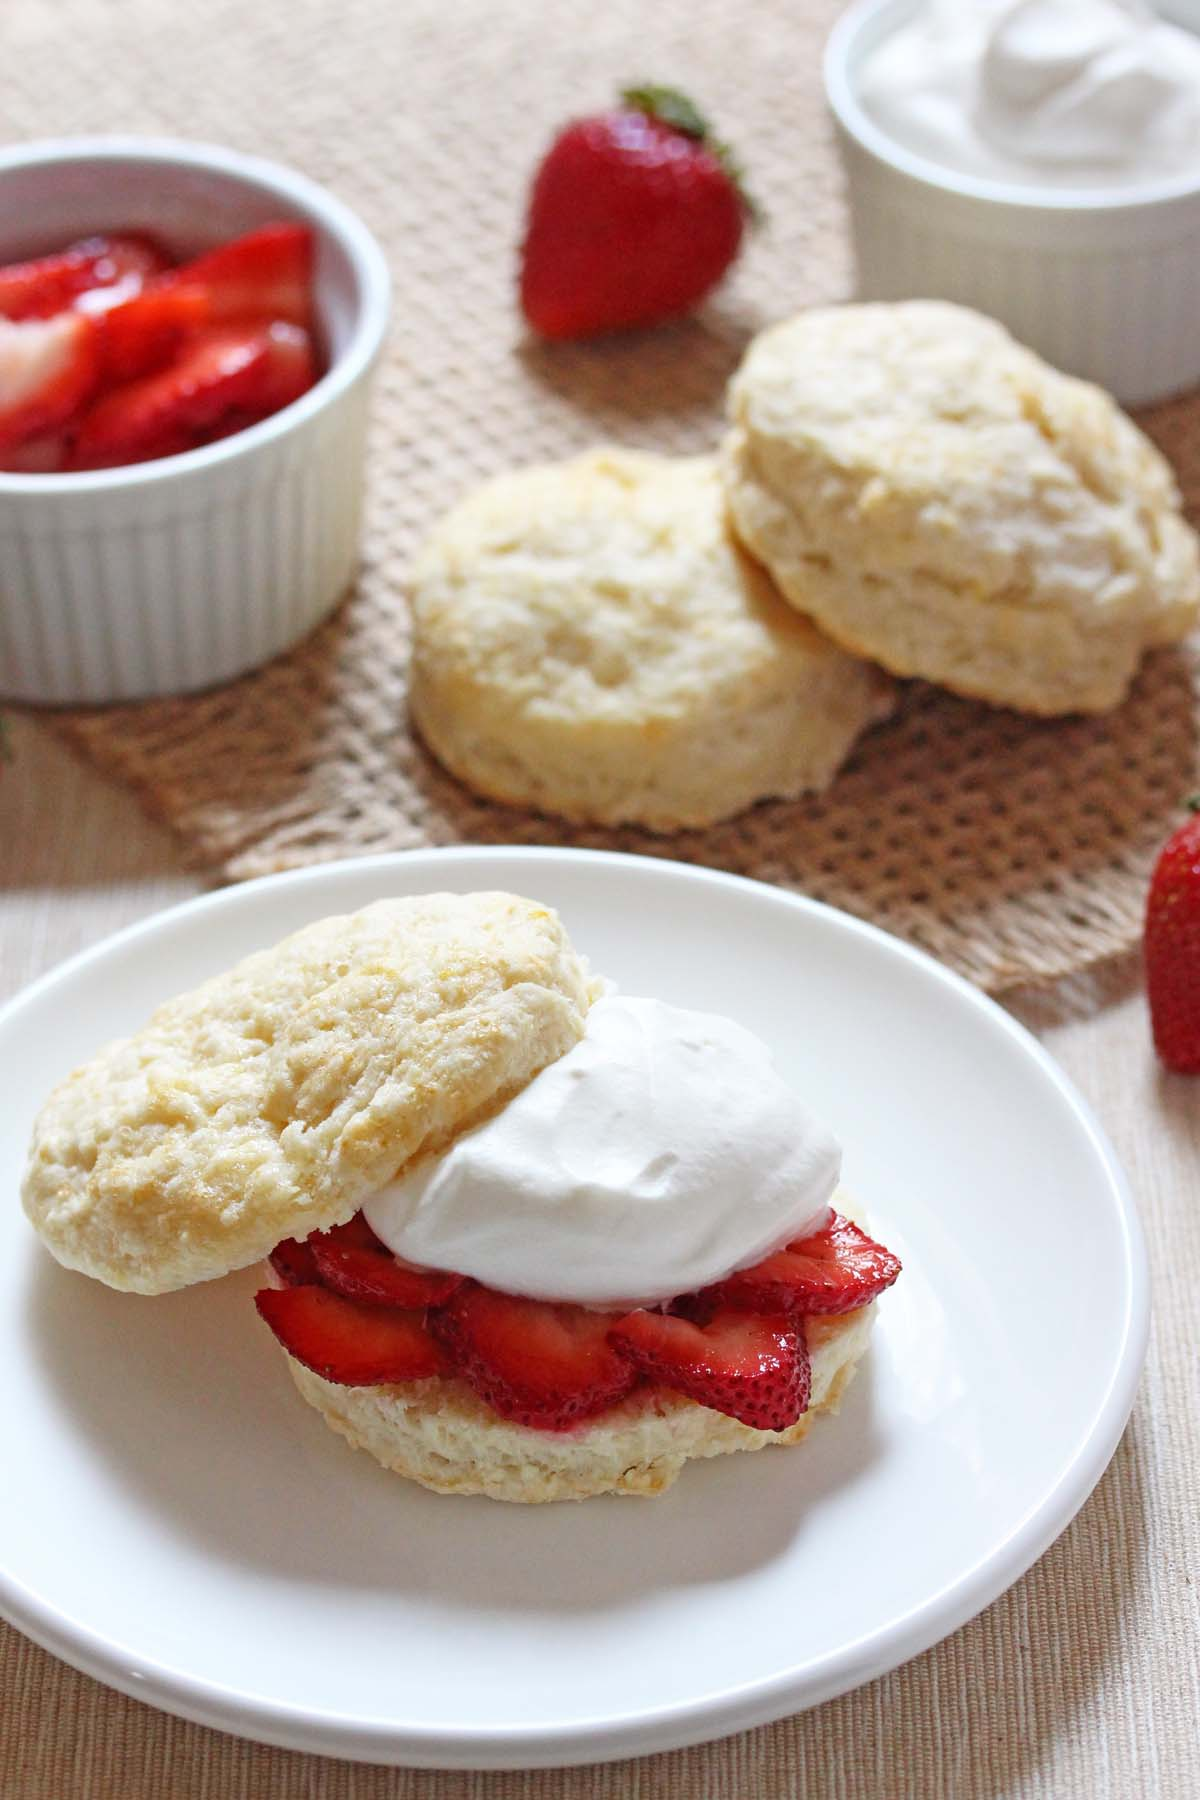 Strawberry Shortcakes from Ashley Marie's Kitchen